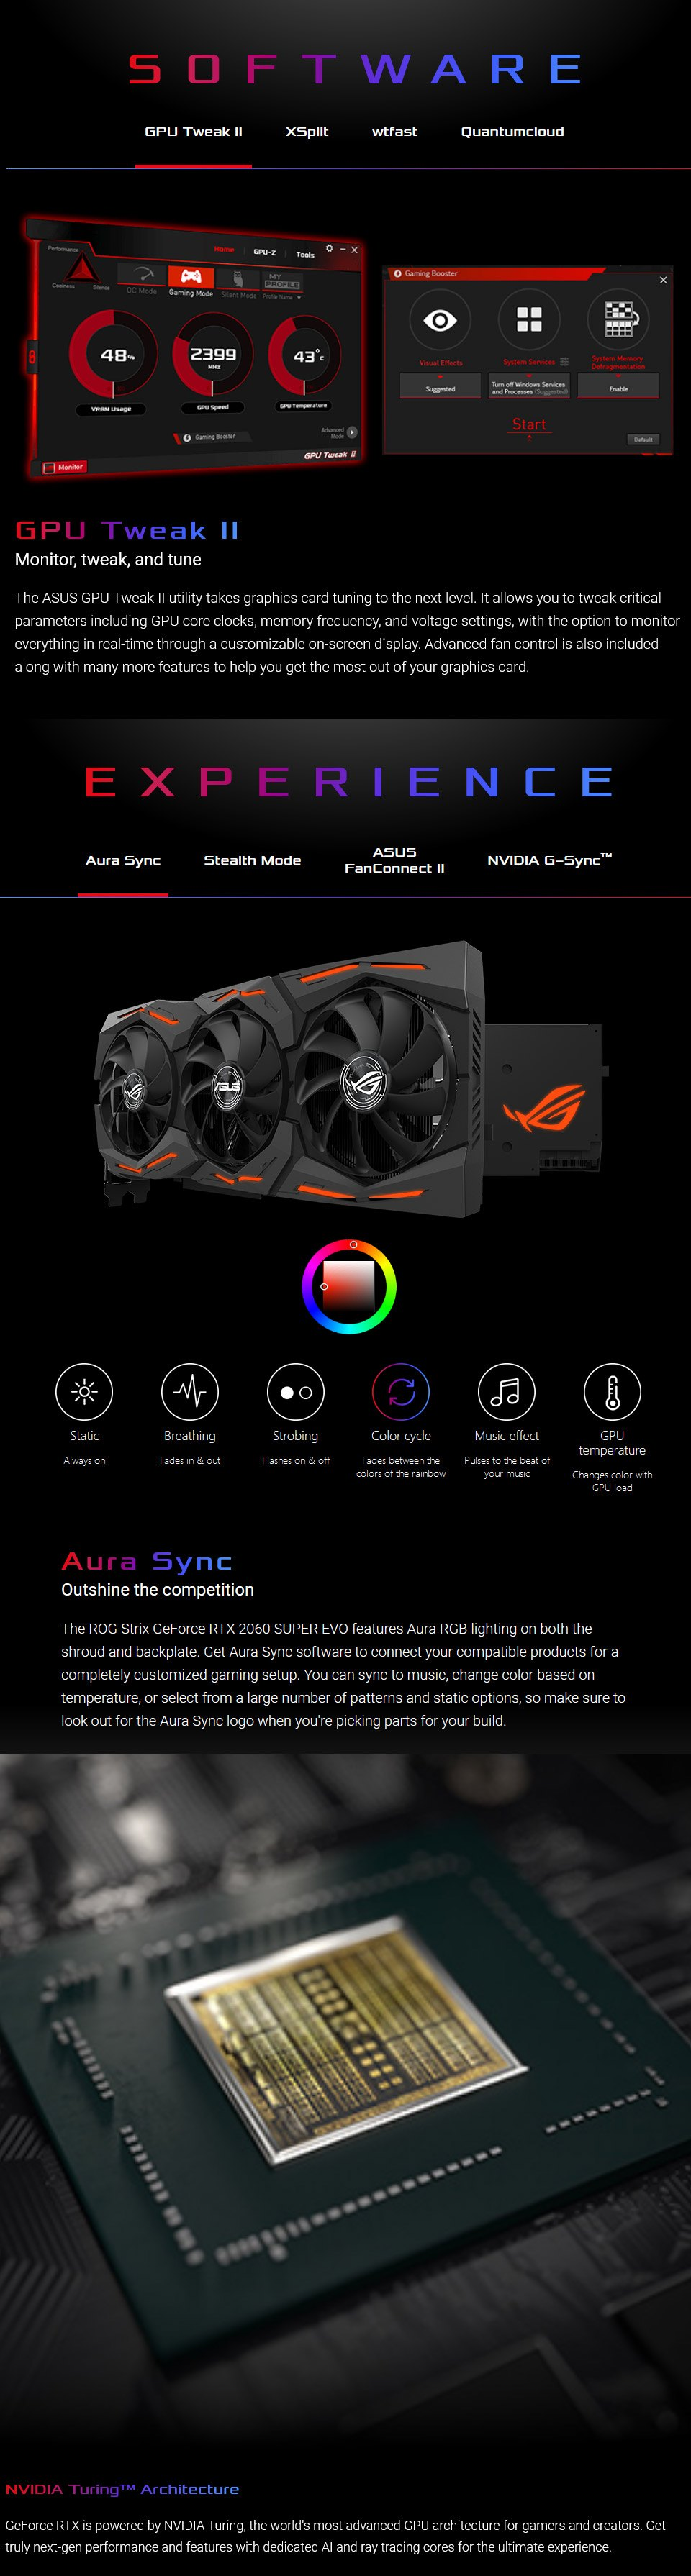 ASUS ROG Strix GeForce RTX 2060 Super EVO OC 8GB features 2